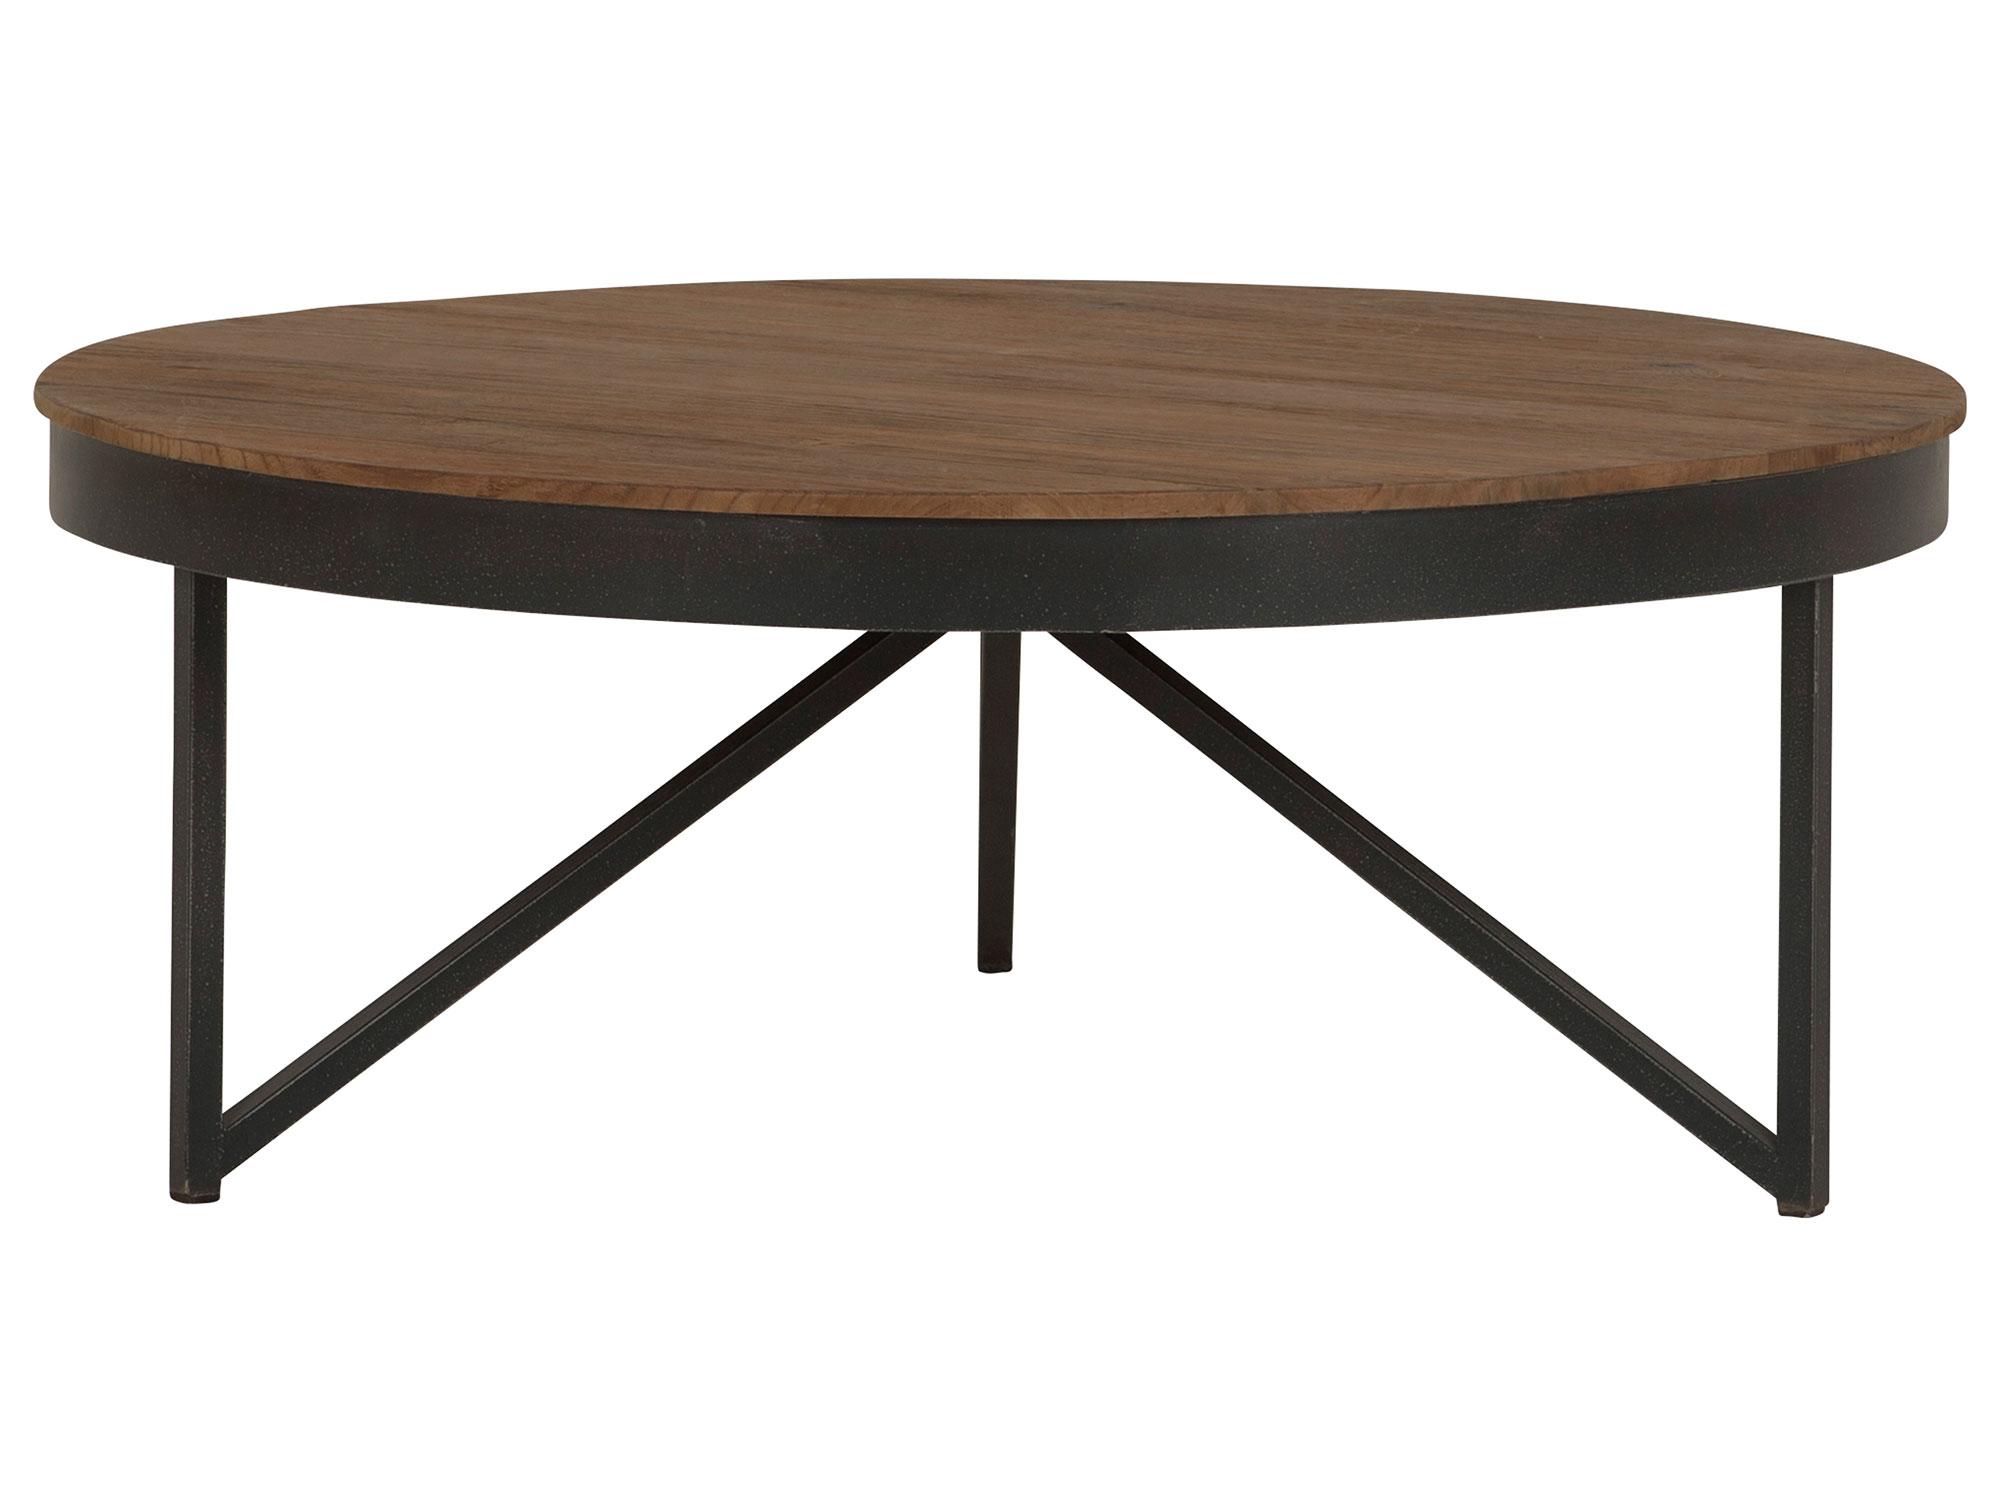 Salontafel fendy rond large Ø90cm fØrn maatwerk meubelen